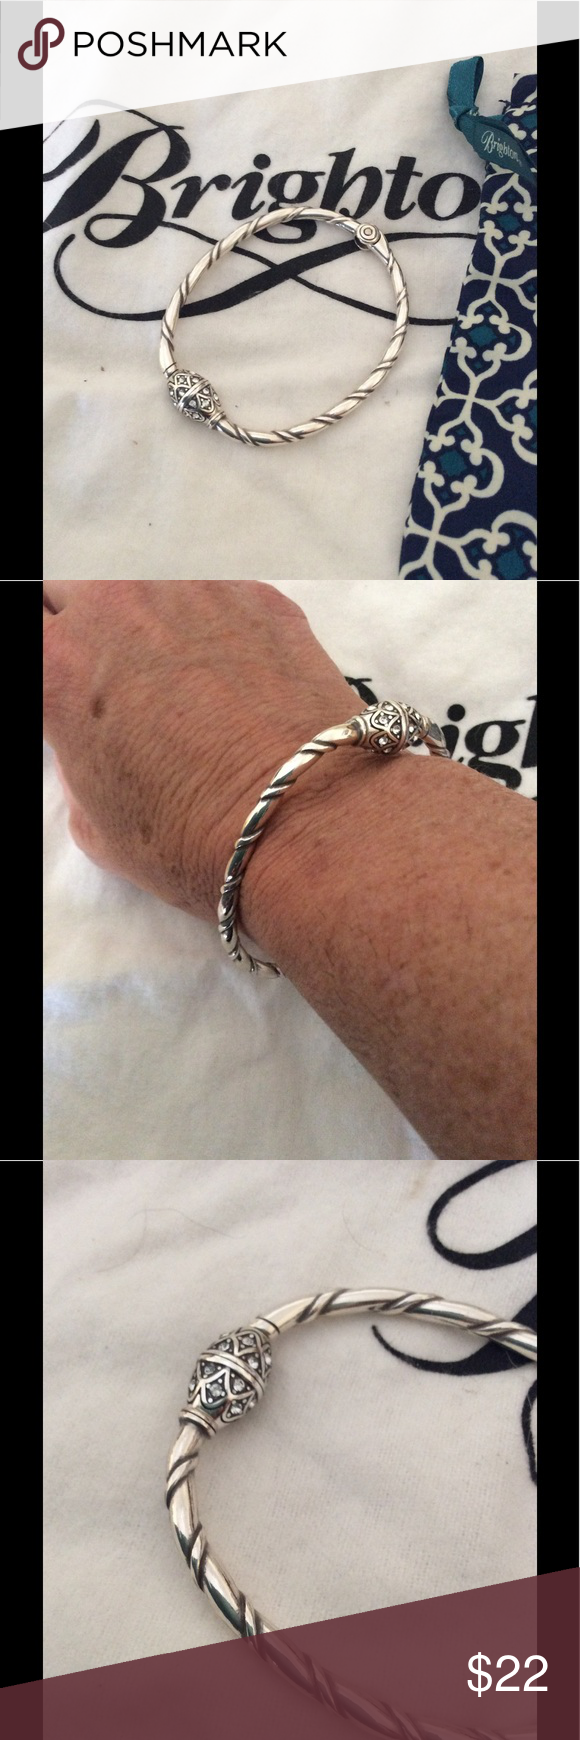 Brighton Charm Holder Bracelet